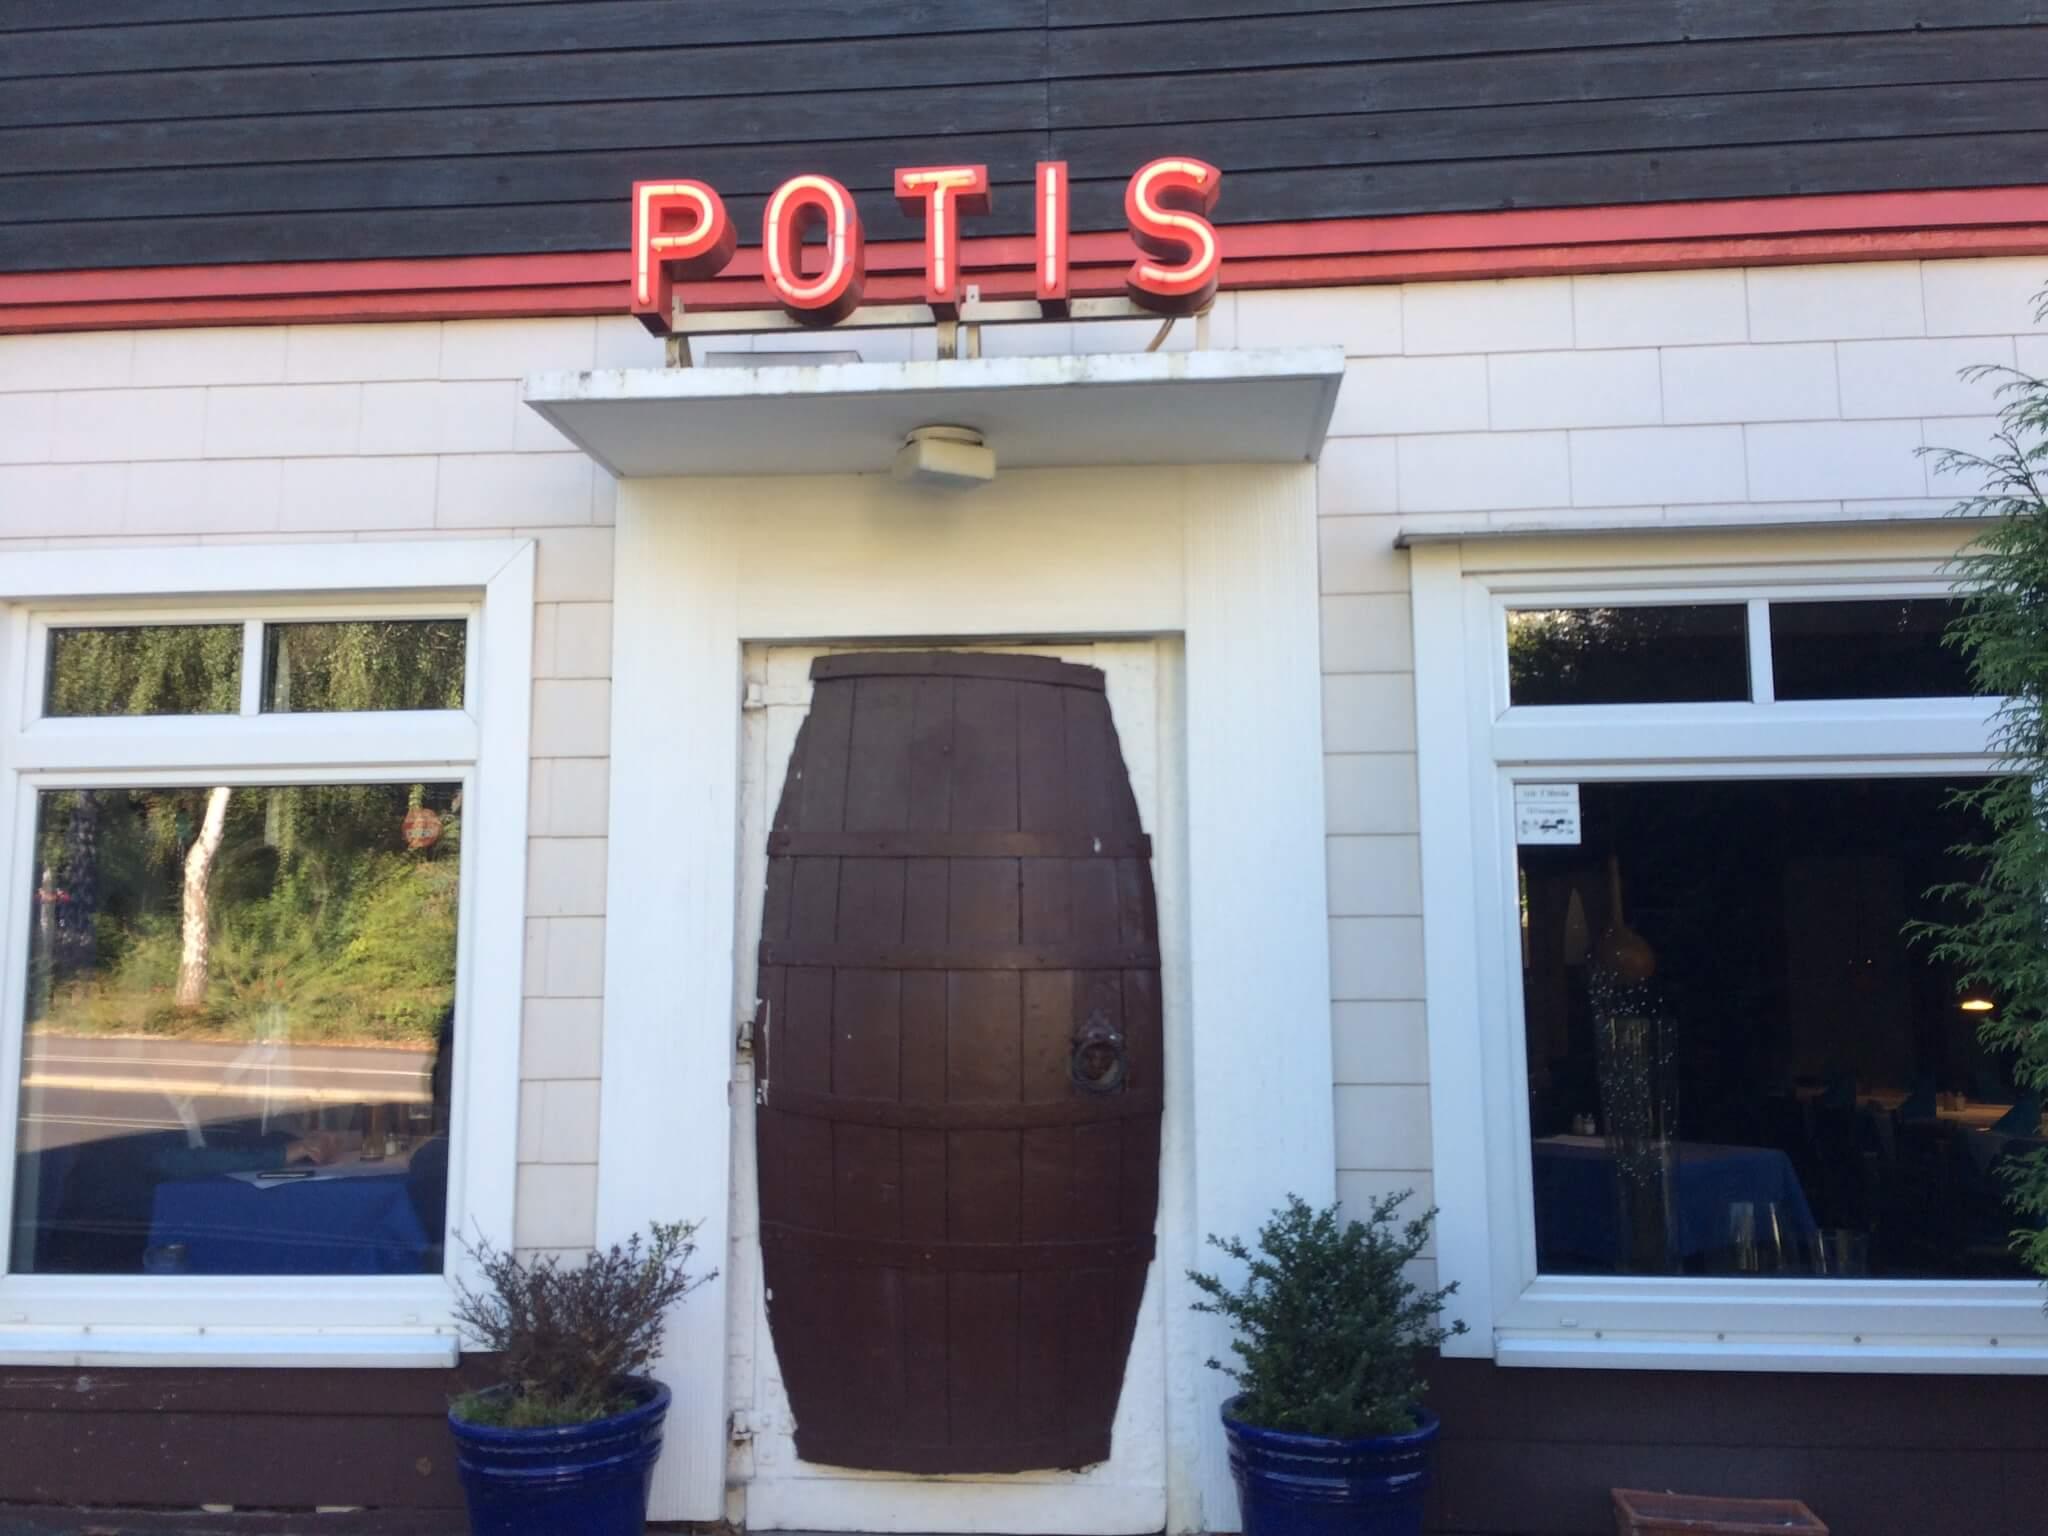 Potis, Göttingen